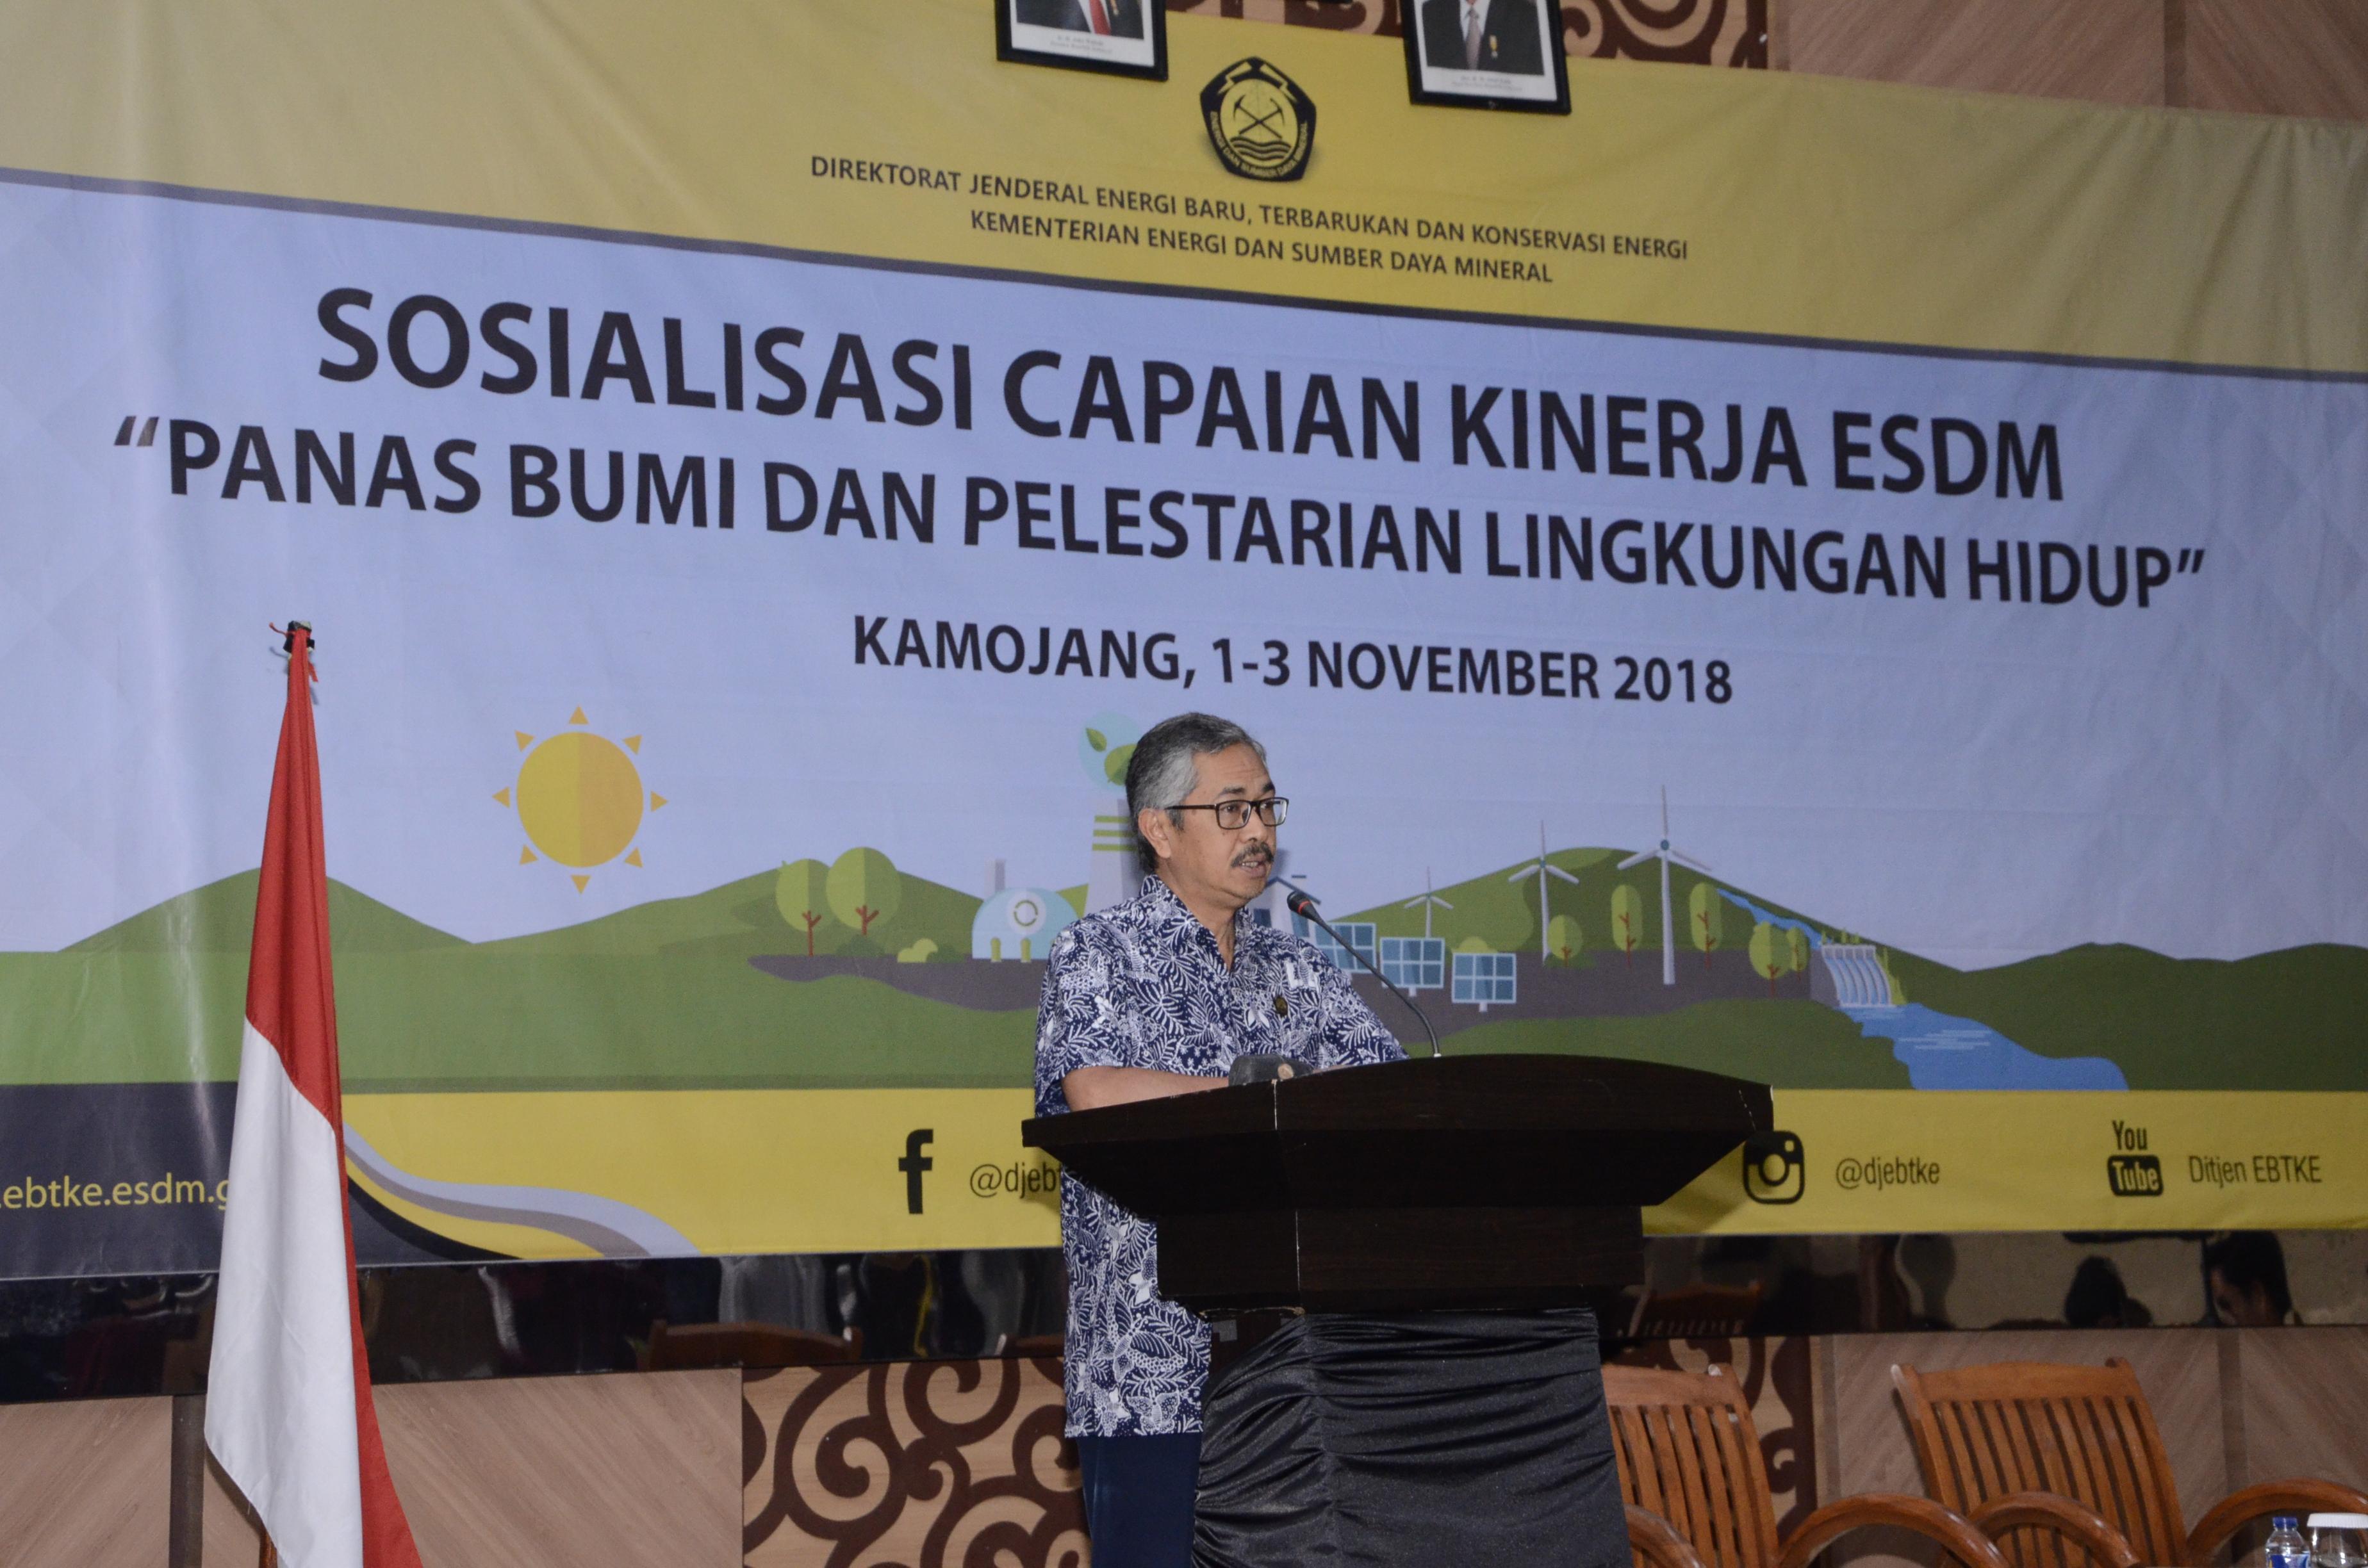 Sambutan Sesditjen EBTKE, Wawan Supriatna pada acara Sosialisasi Capaian Kinerja Sektor ESDM dengan topik khusus Panas Bumi dan Pelestarian Lingkungan Hidup